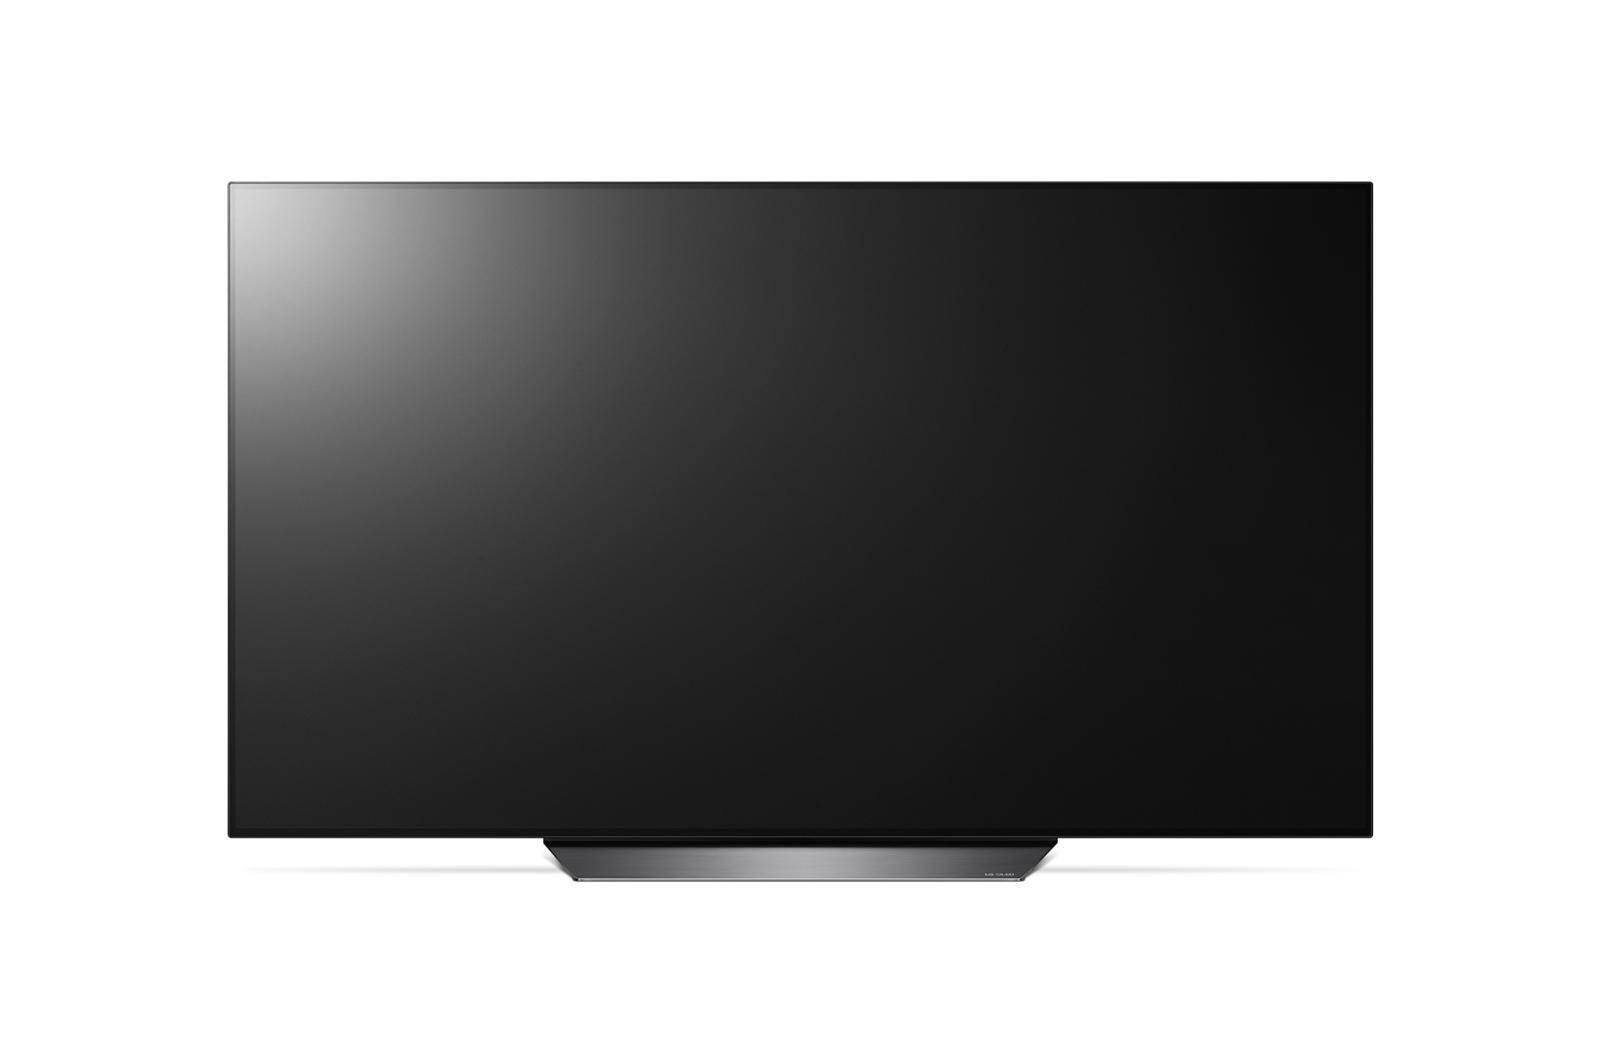 LG OLED55B8PLA telewizor premium OLED